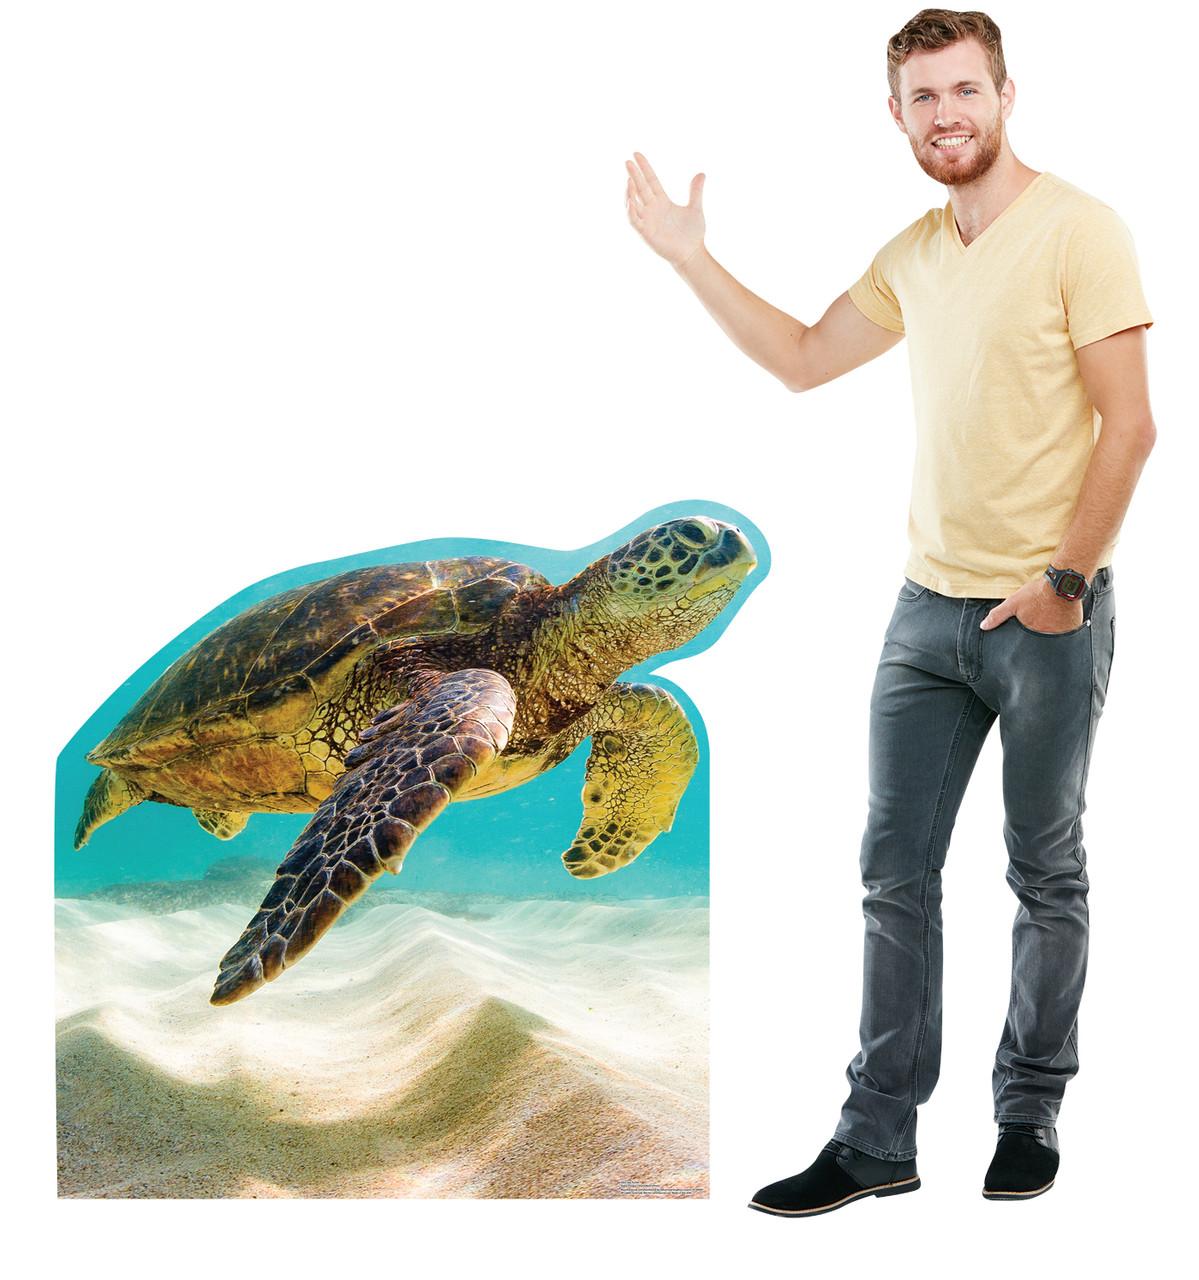 Sea Turtle Cardboard Cutout 3053